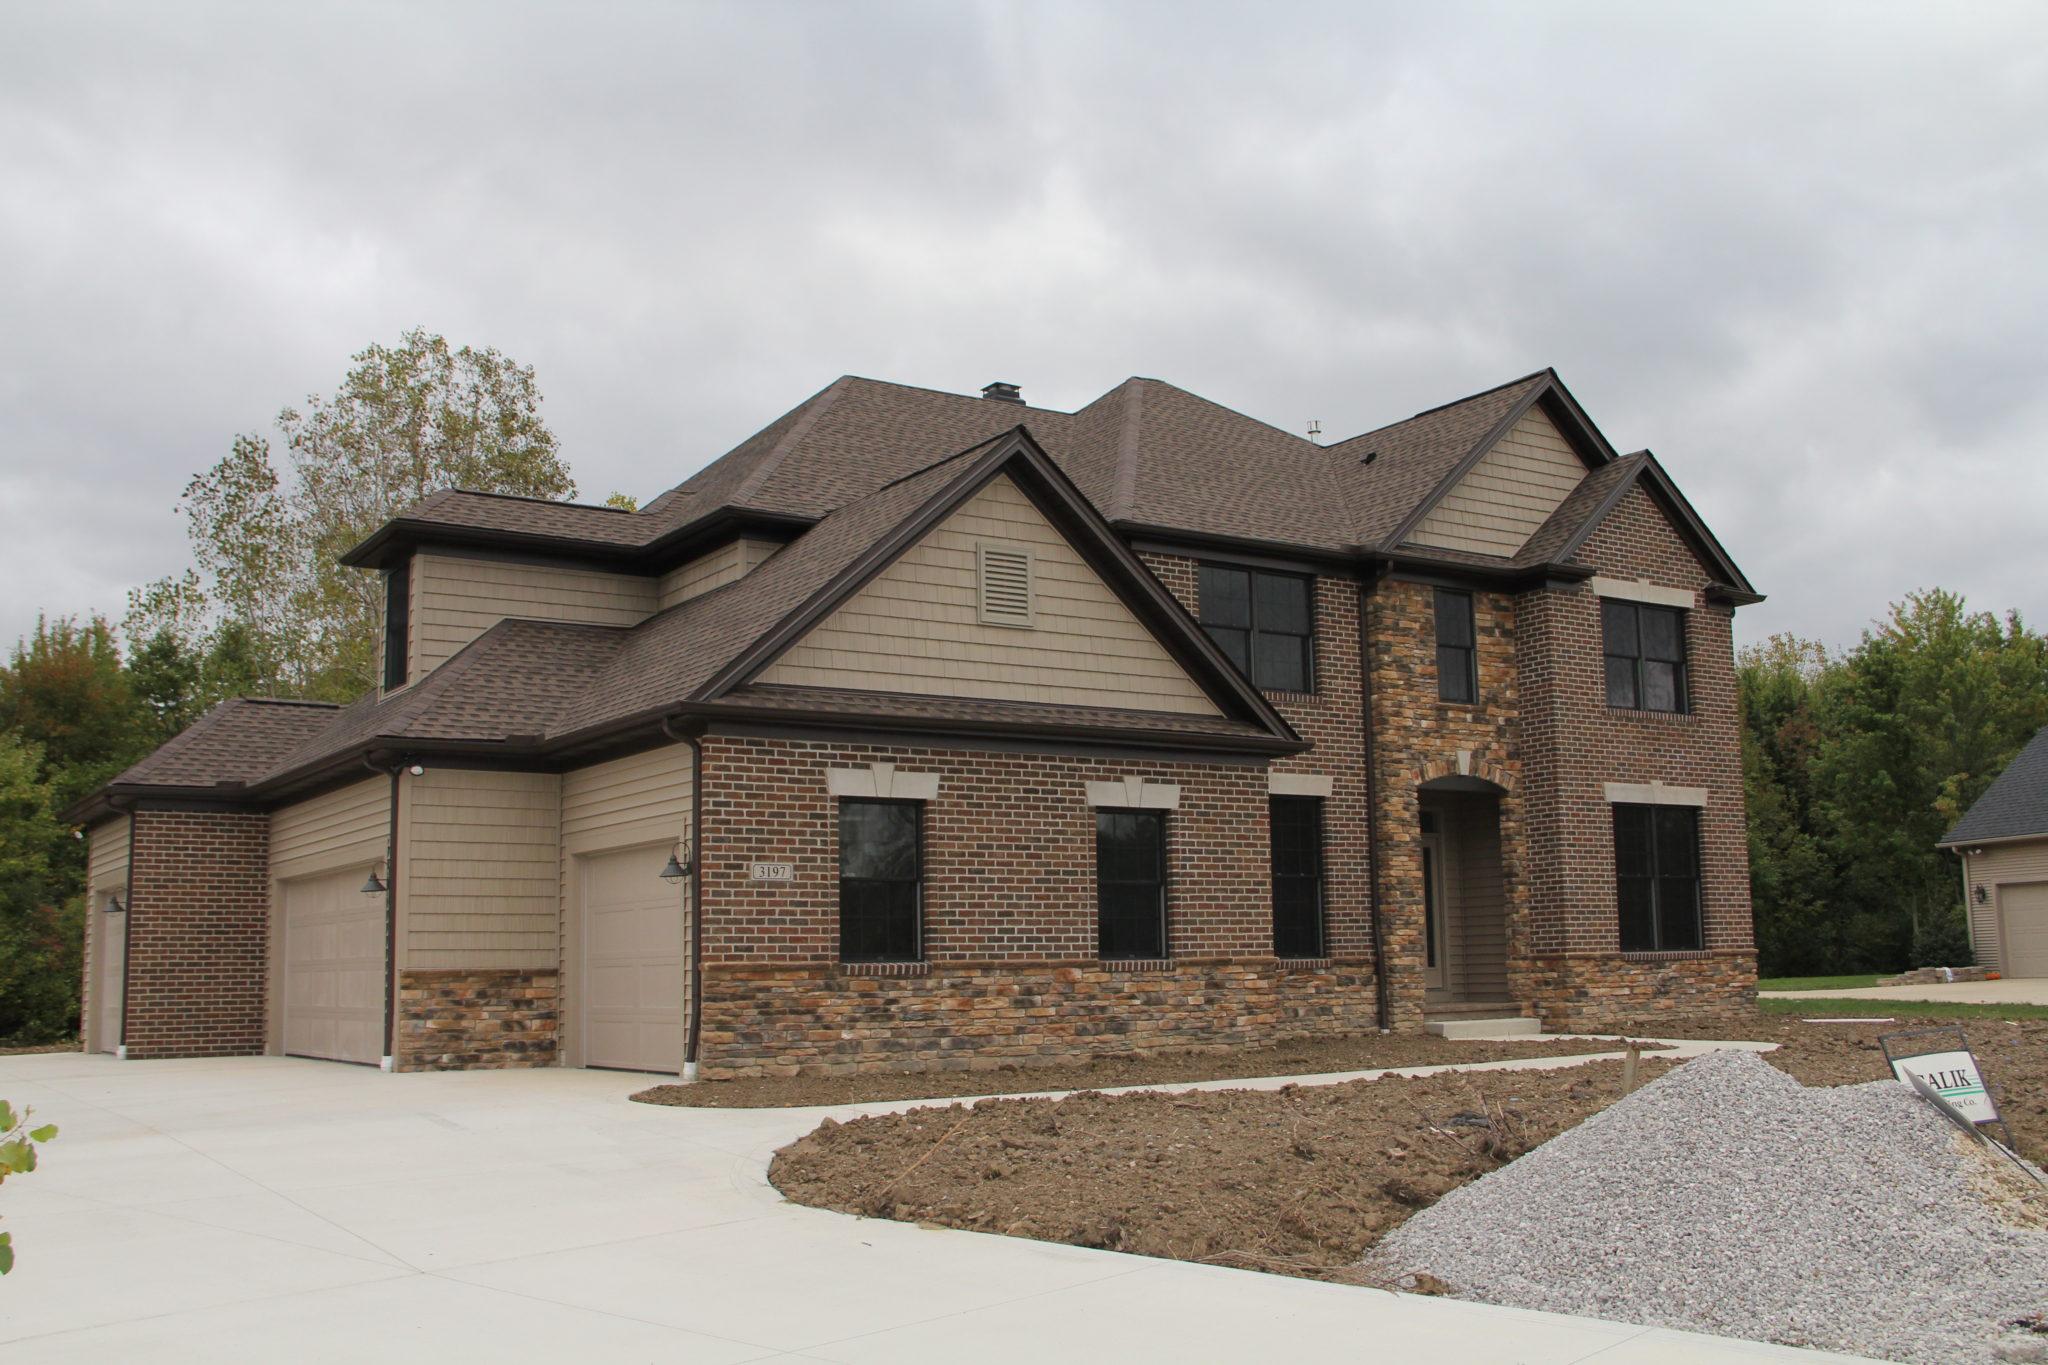 Custom Home near Cleveland, OH built by Galik Building